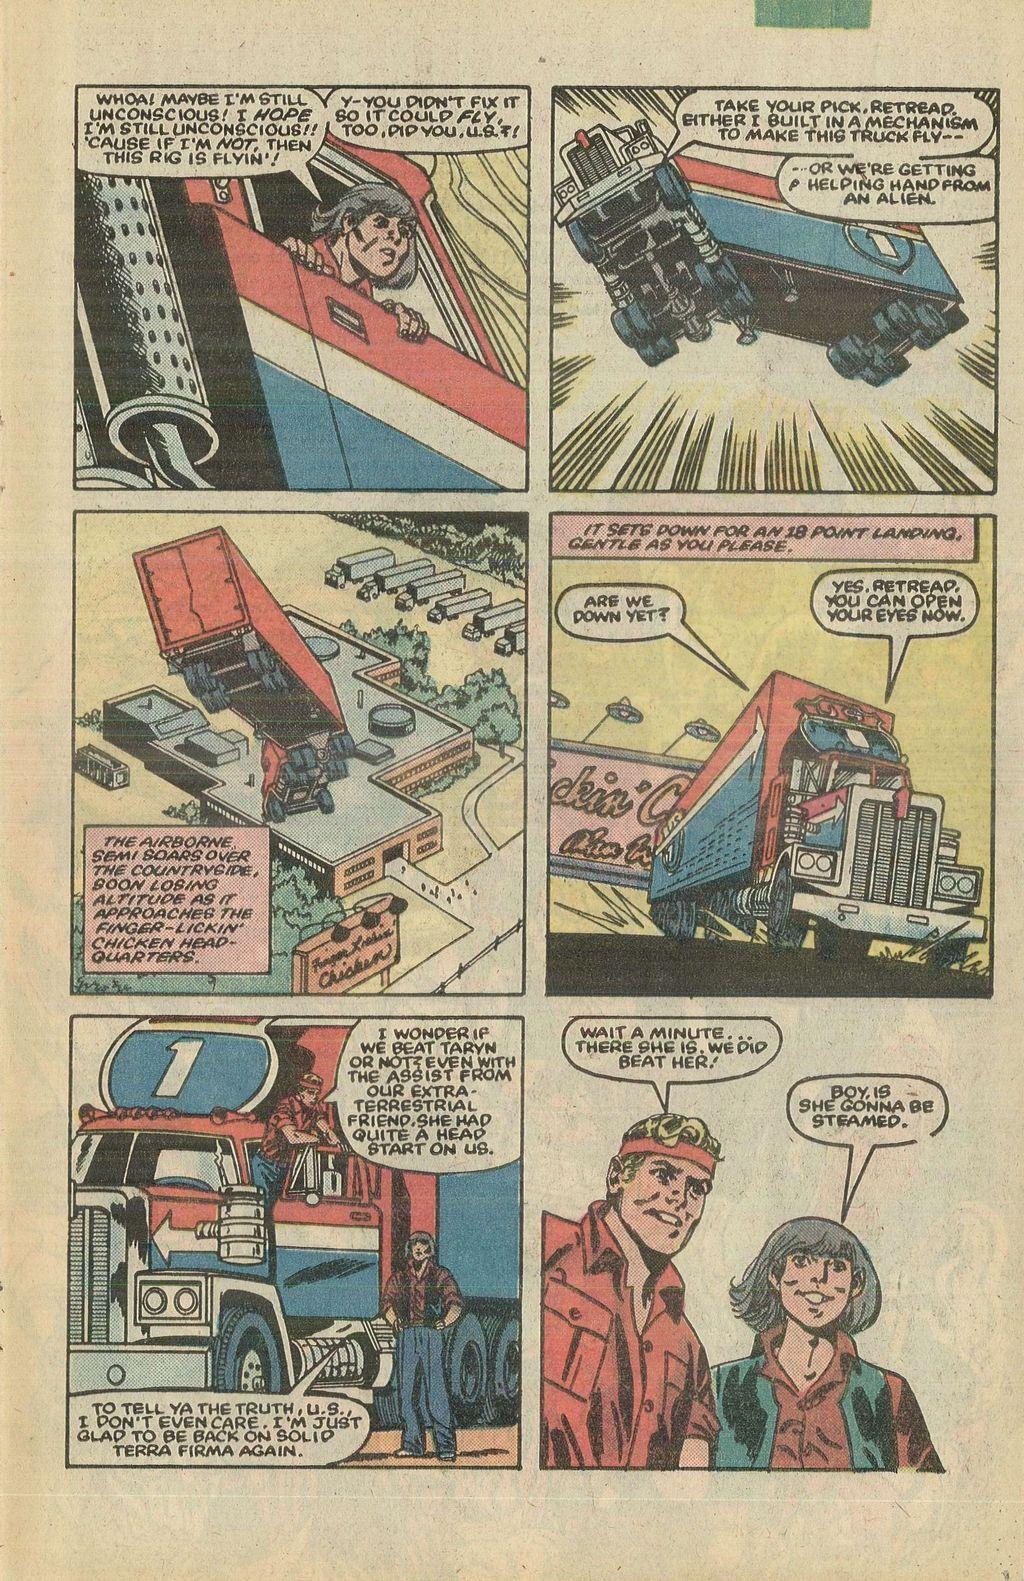 Read online U.S. 1 comic -  Issue #5 - 29